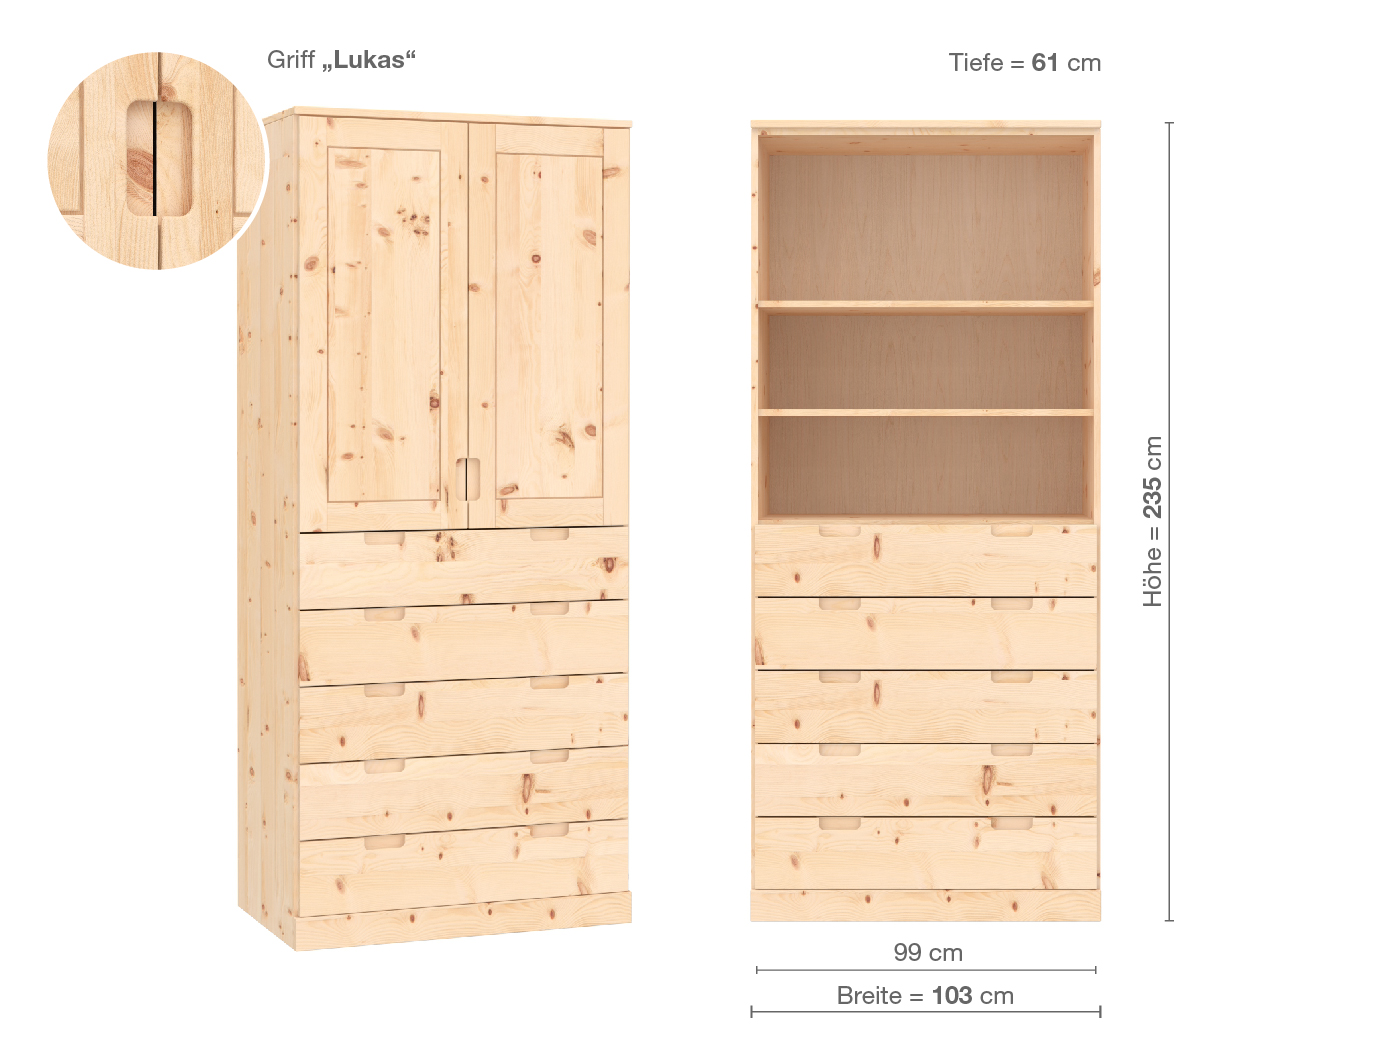 "Zirbenschrank ""Edelweiß"", 2-türig, Höhe 235 cm, Griffausführung ""Lukas"", Inneneinrichtung E"